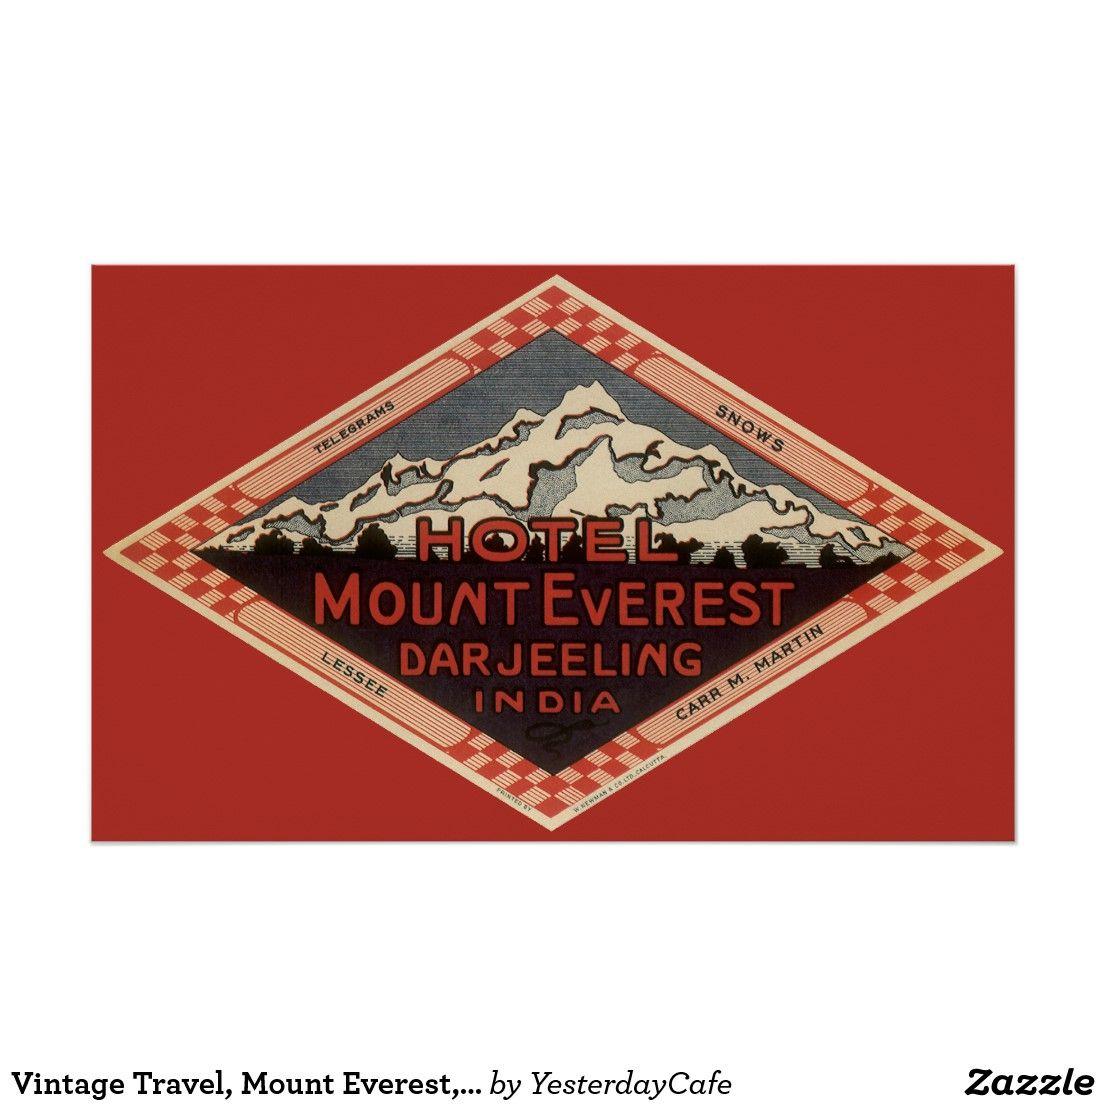 Vintage Travel Mount Everest Darjeeling India Poster Zazzle Com In 2020 Vintage Travel India Poster Vintage Travel Posters